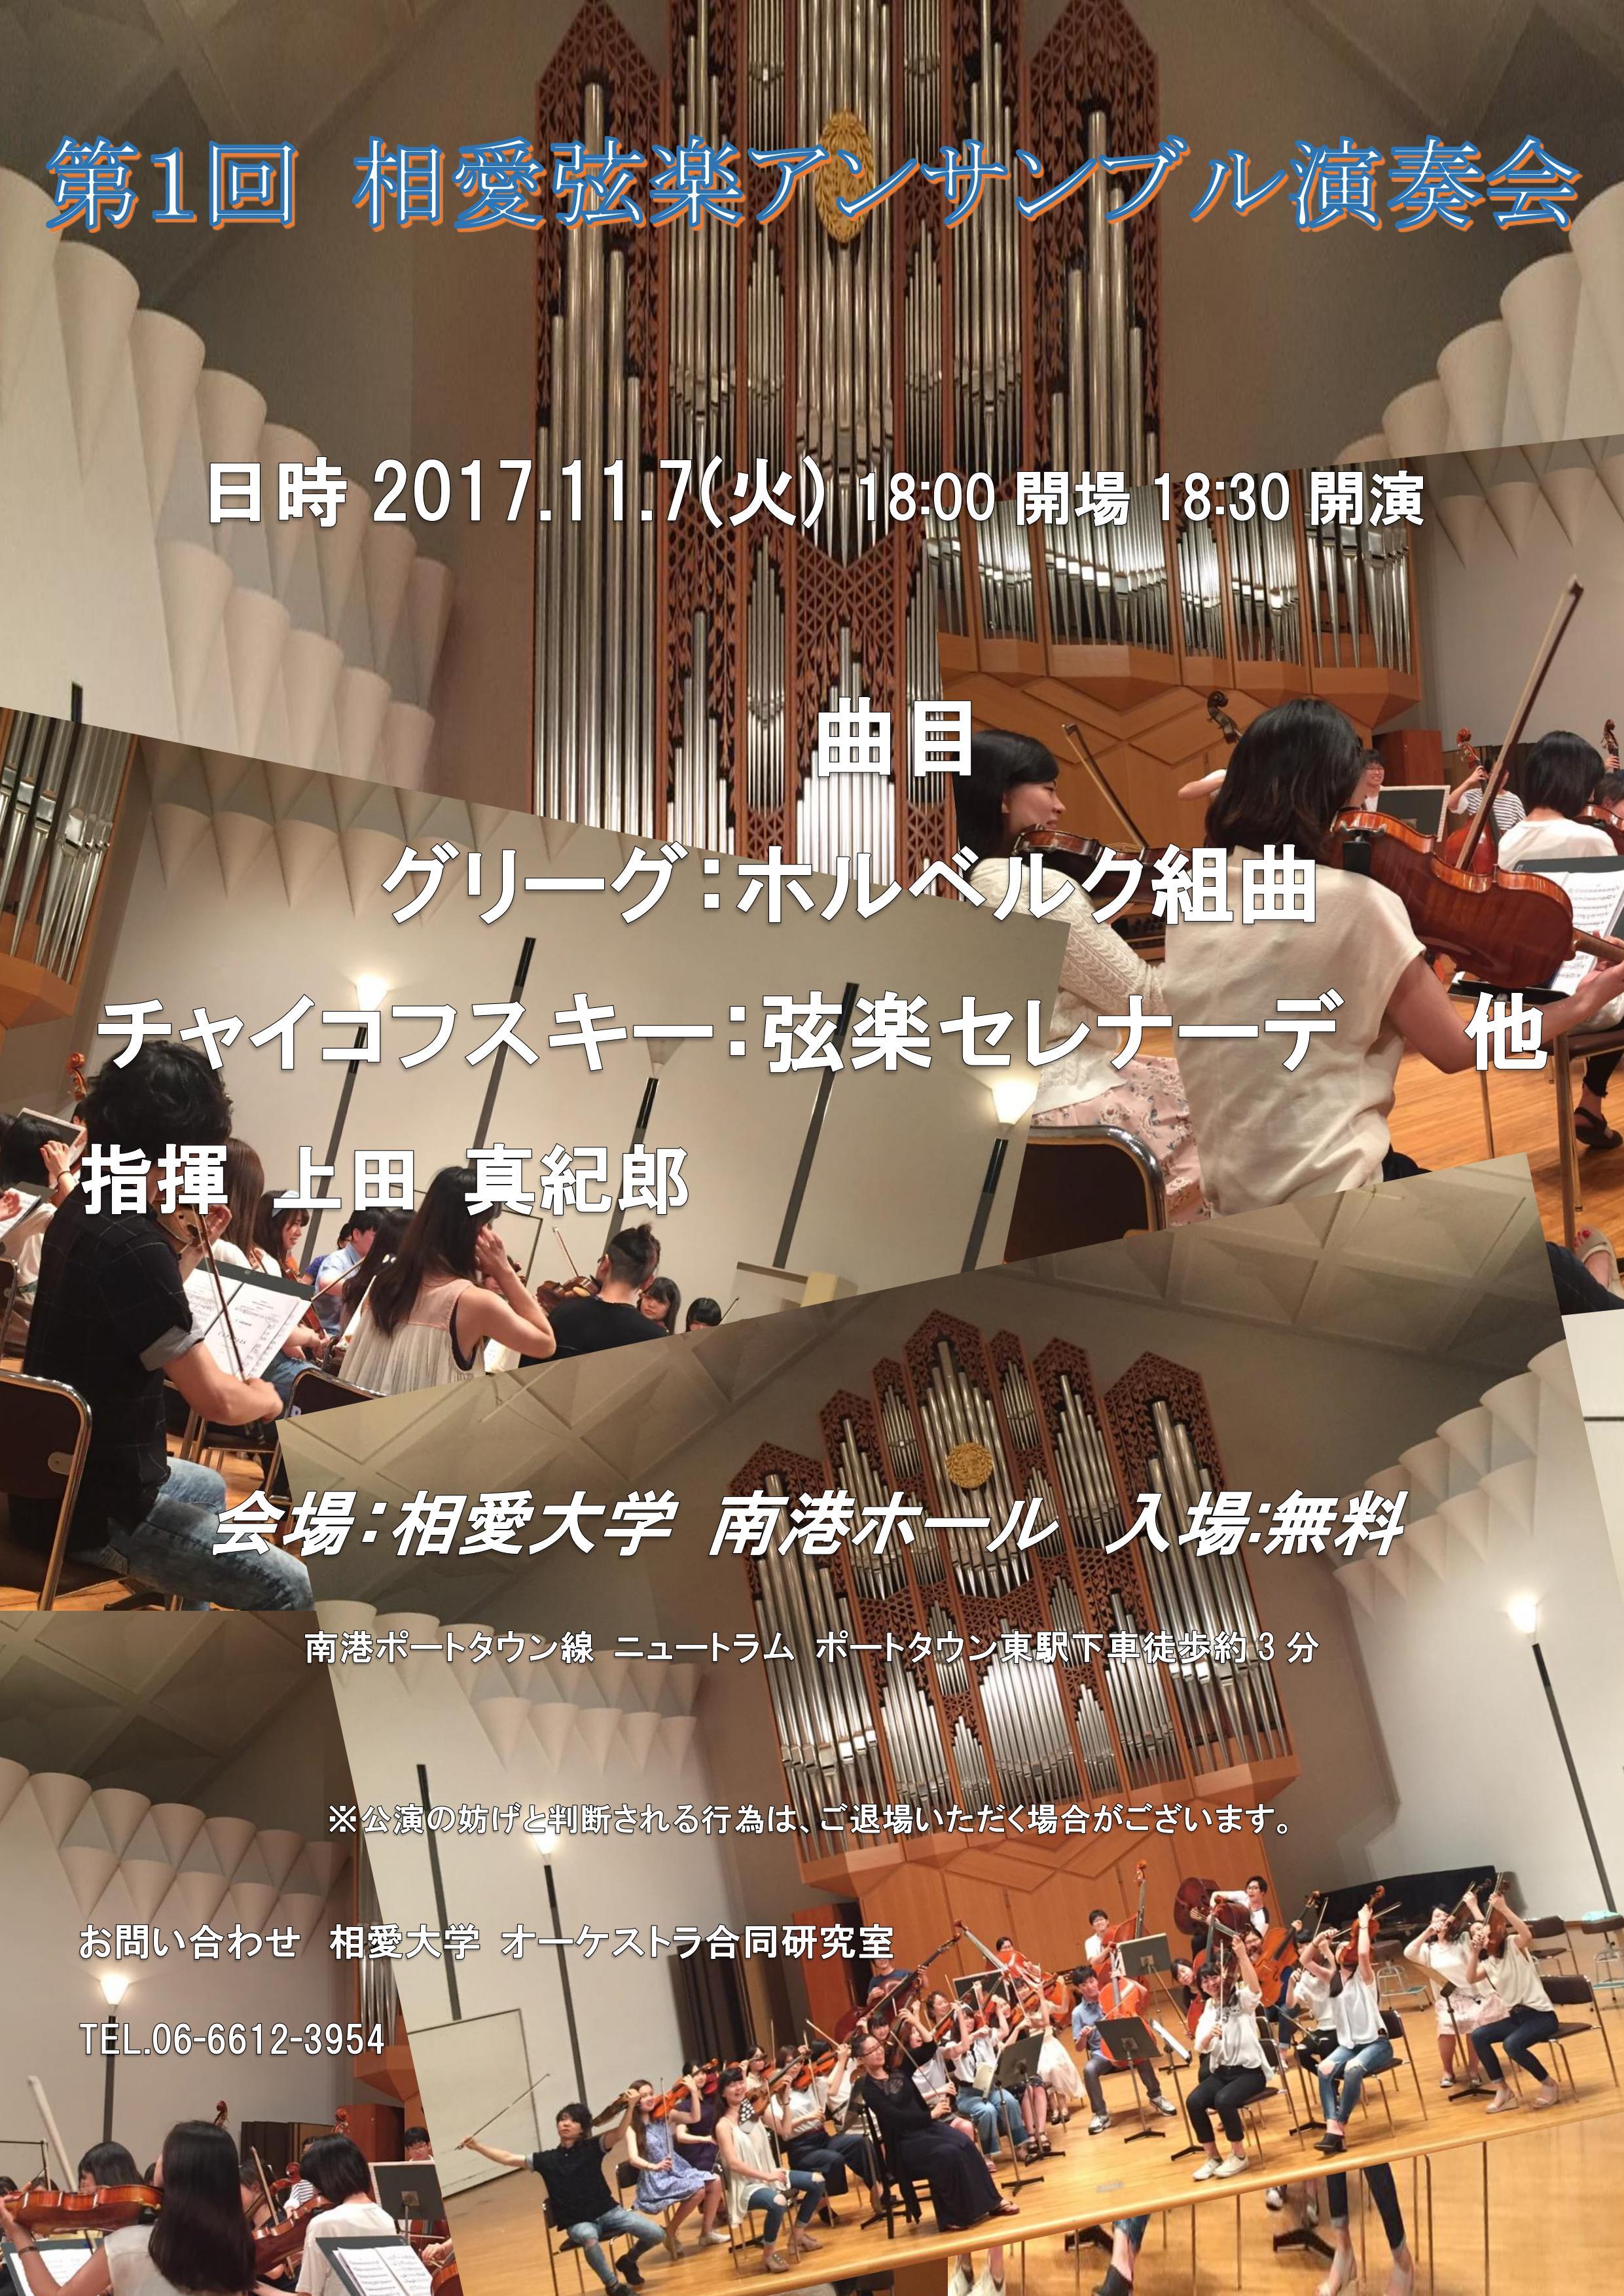 http://www.soai.ac.jp/information/concert/20171107_string-ensemble.jpg